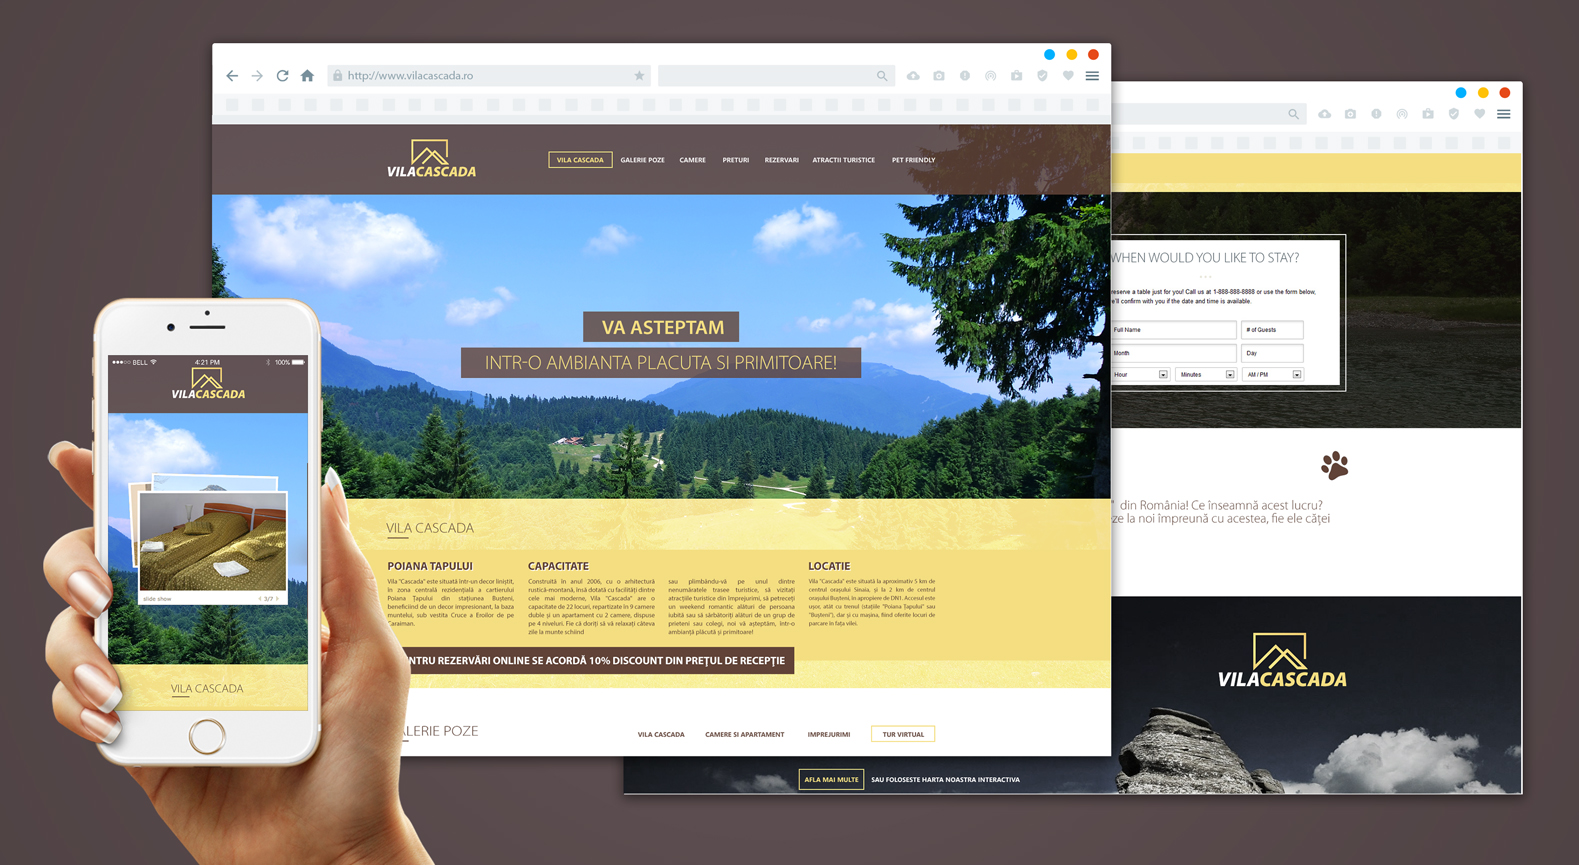 tudor_deleanu_creative_design_art_advertising_web_website__0003_vilacascada